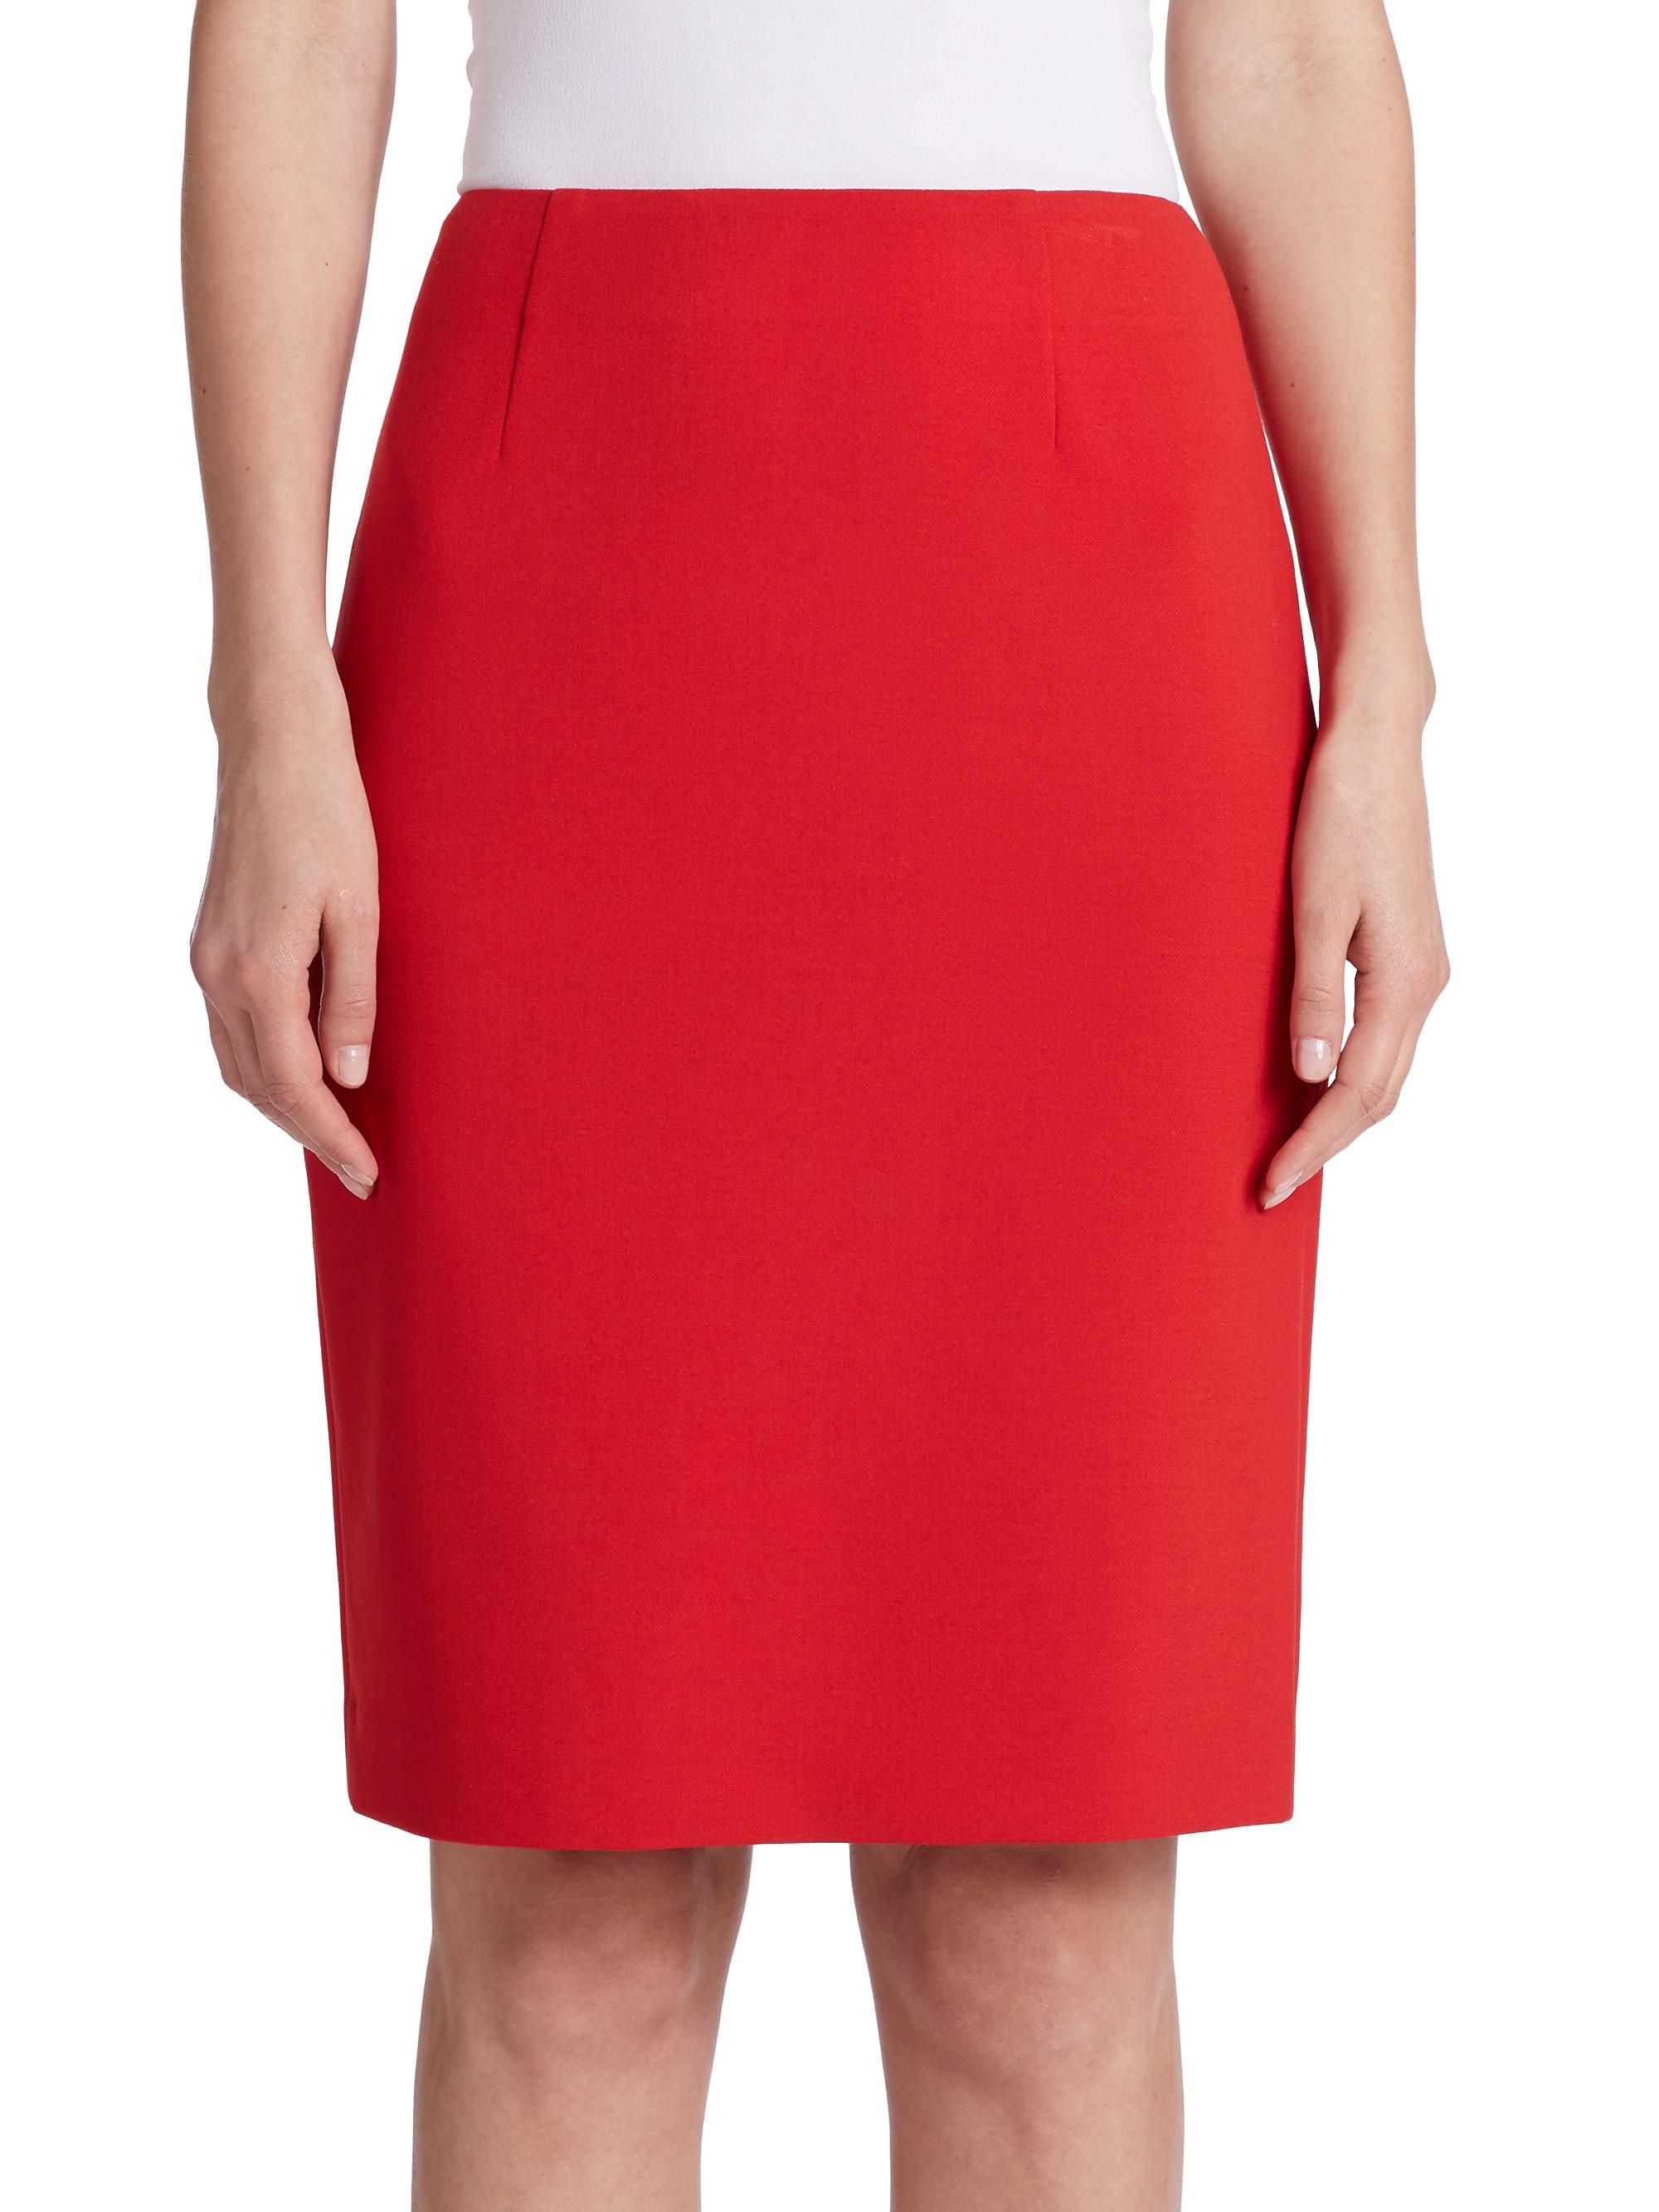 Diane von Furstenberg Red Shilah Pencil Skirt